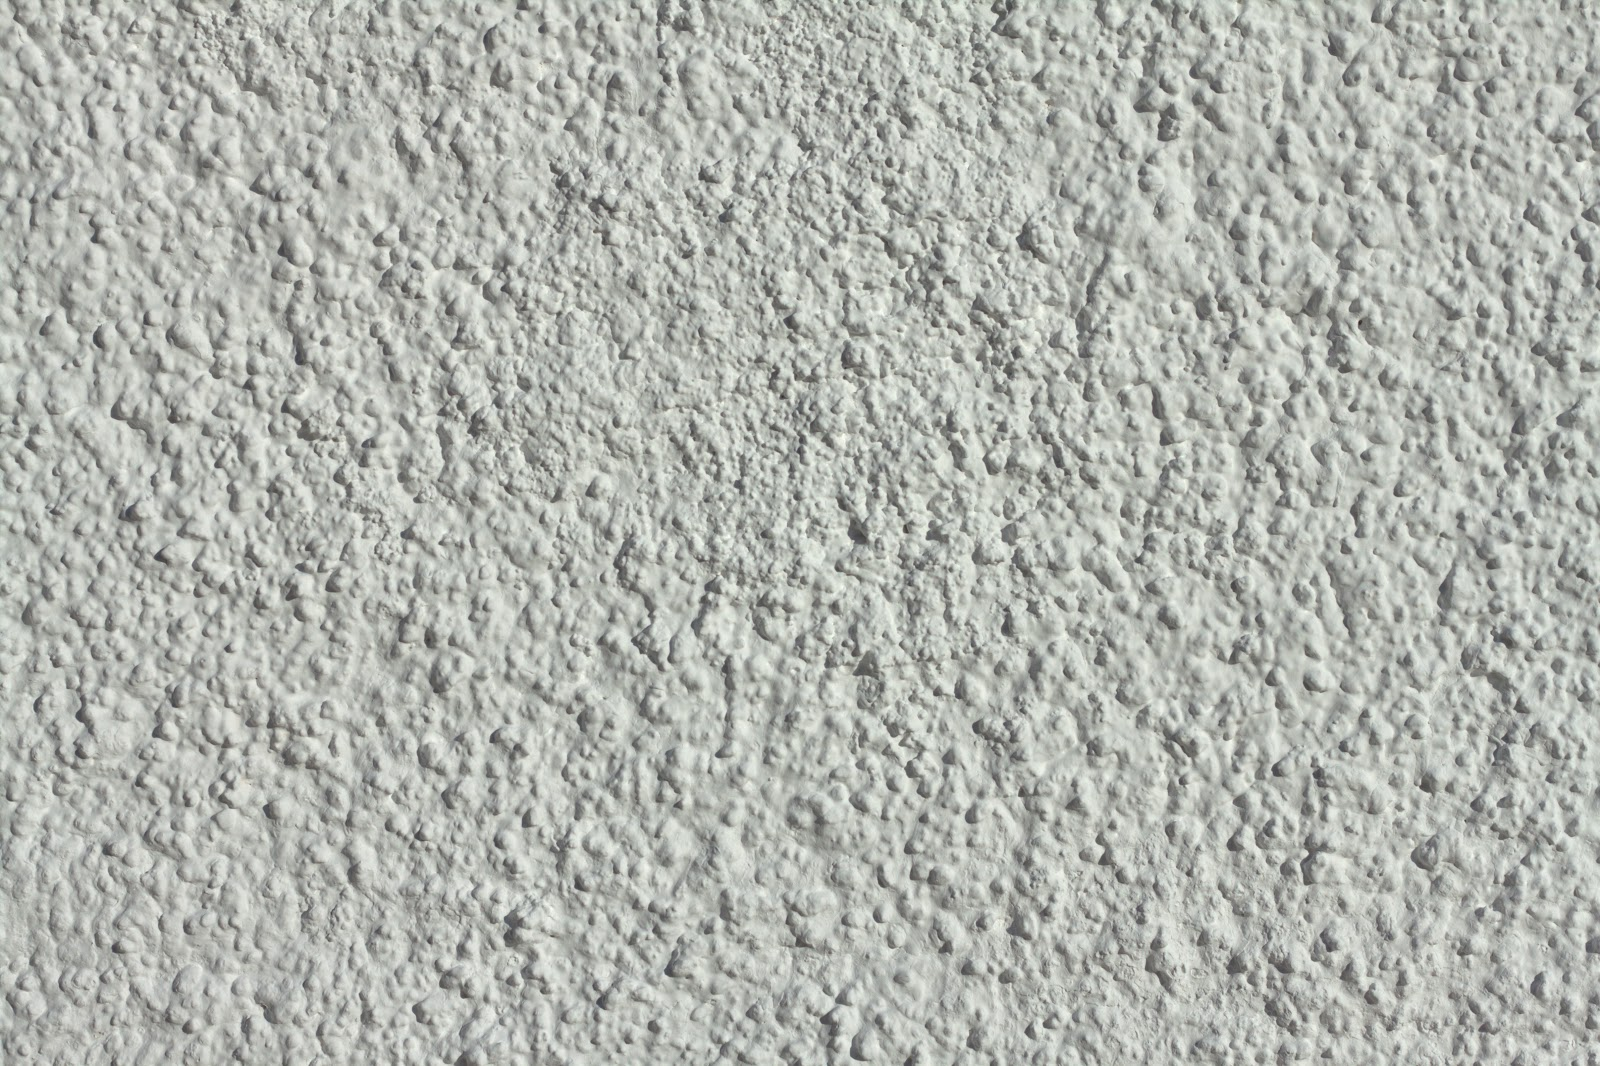 Stucco white wall plaster texture 4770x3178